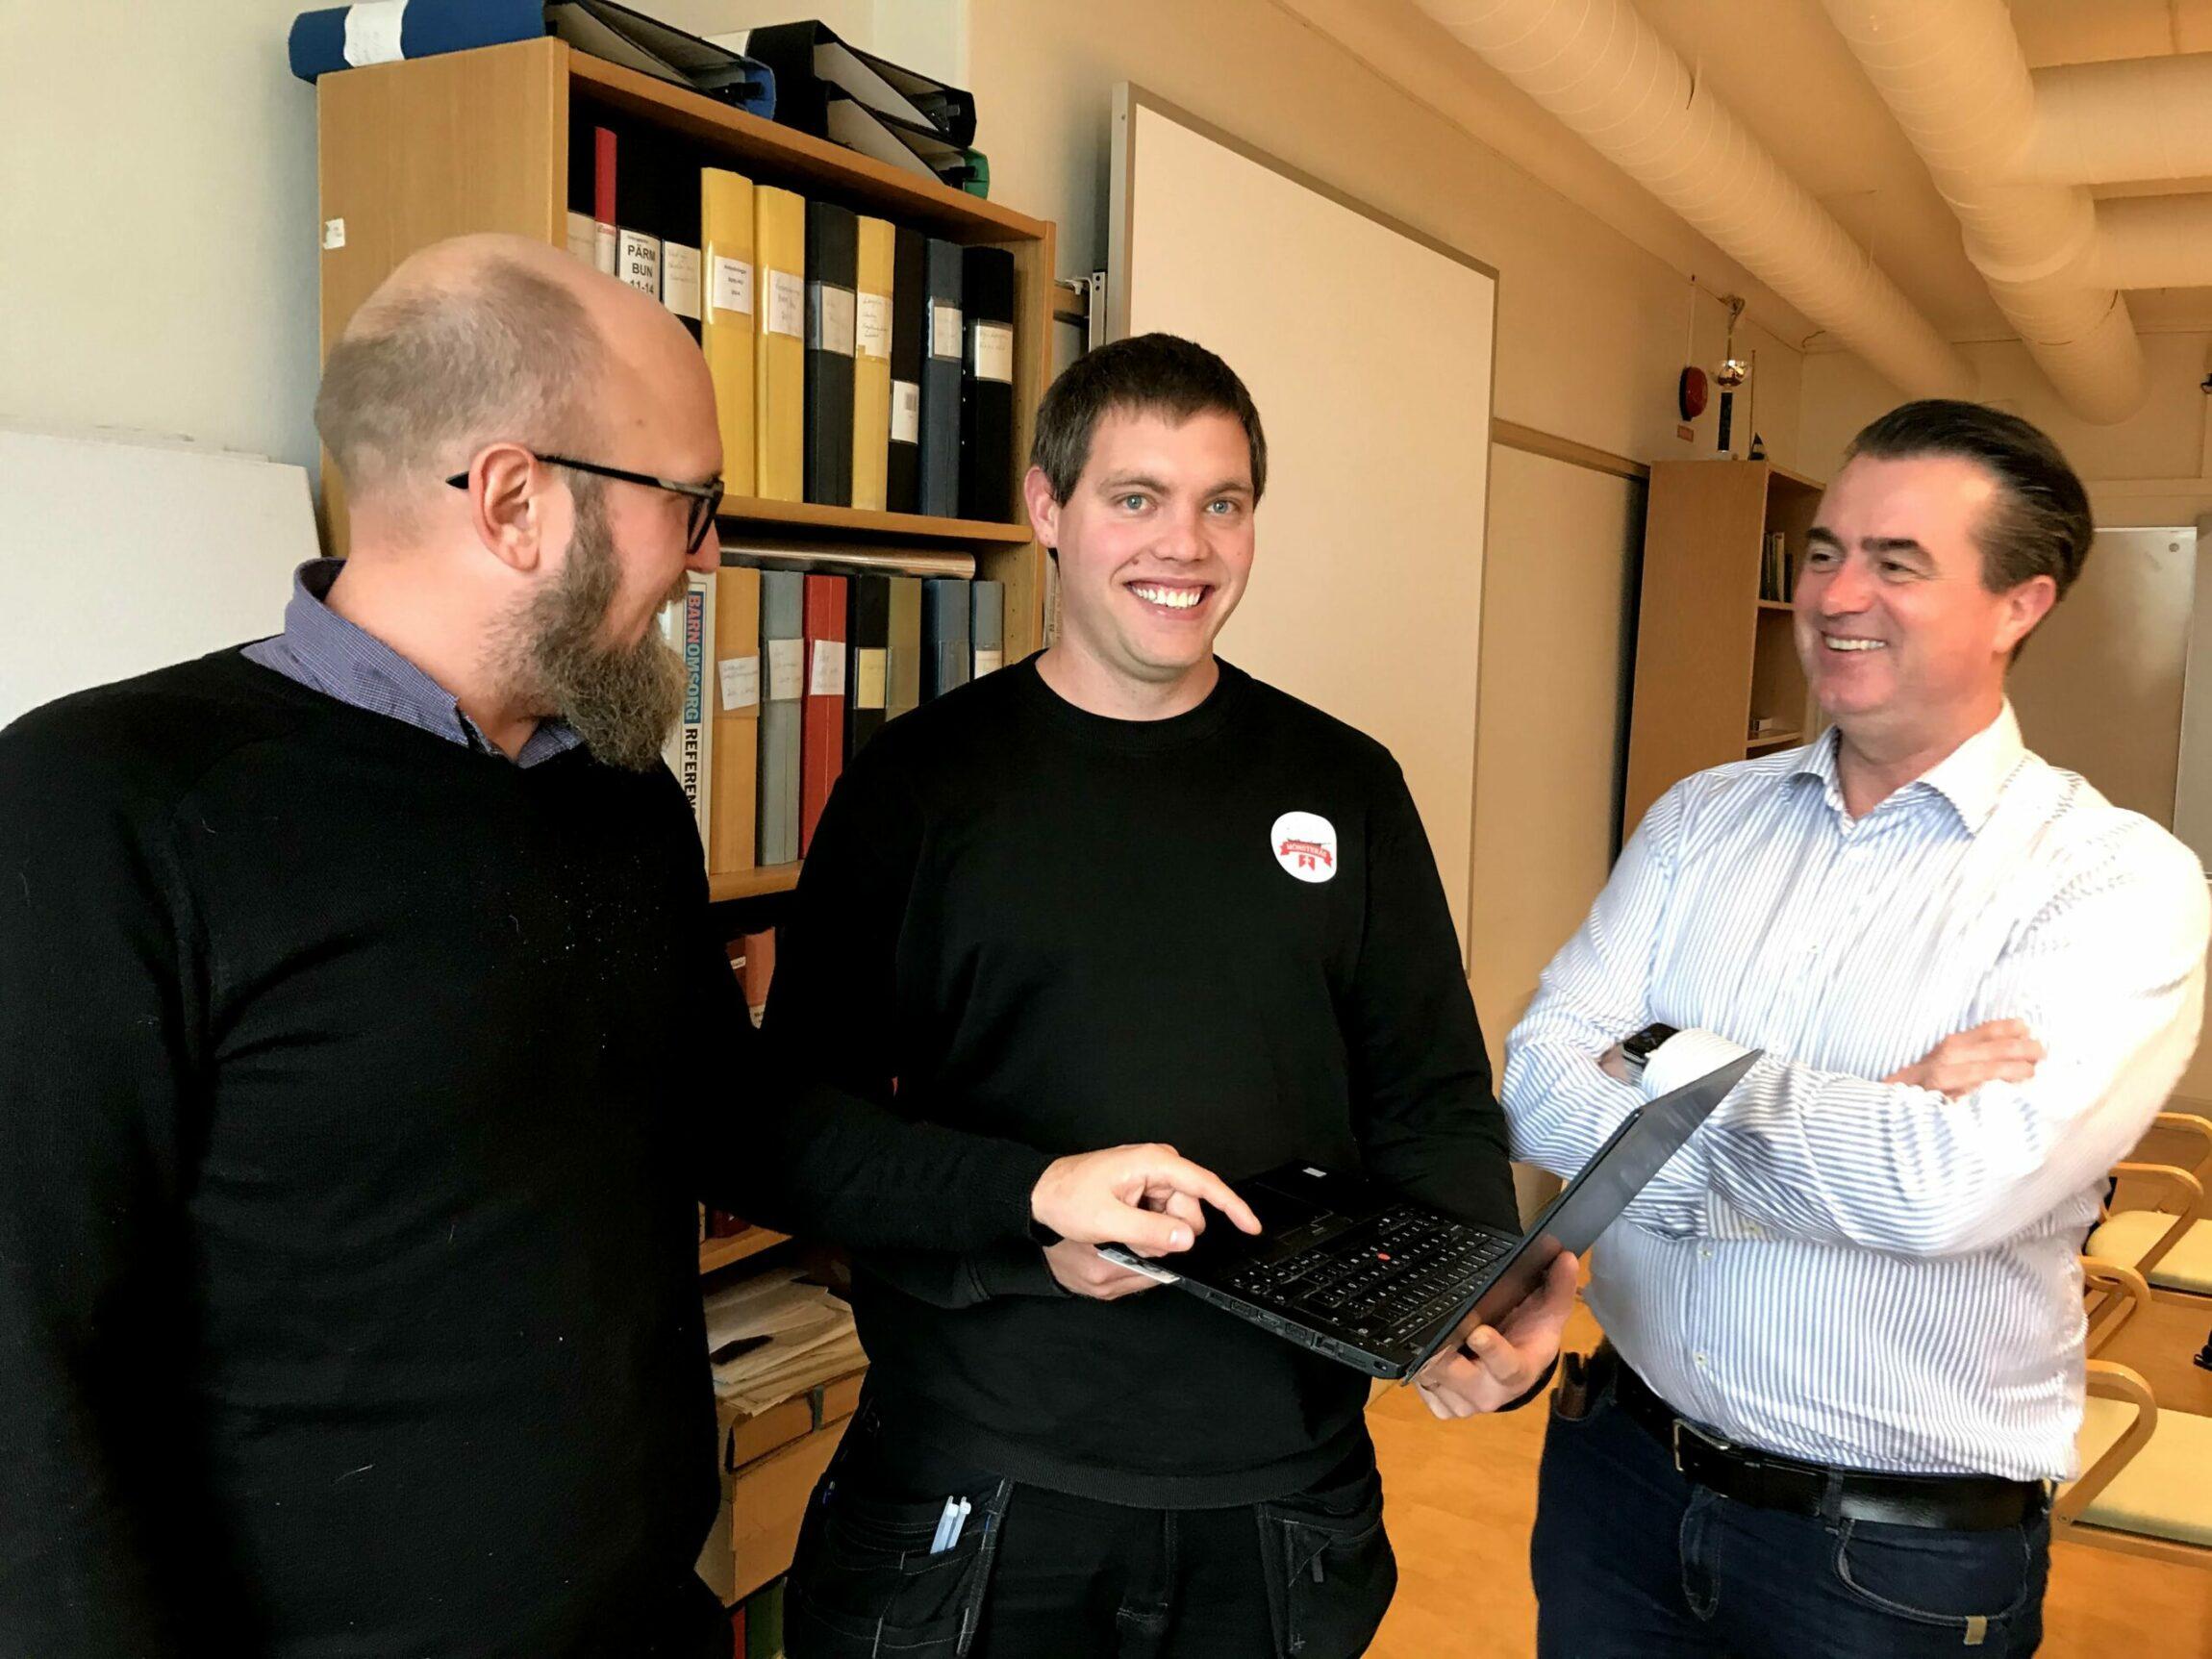 Mönsterås municipality develops long-term strategic work for energy efficiency in buildings